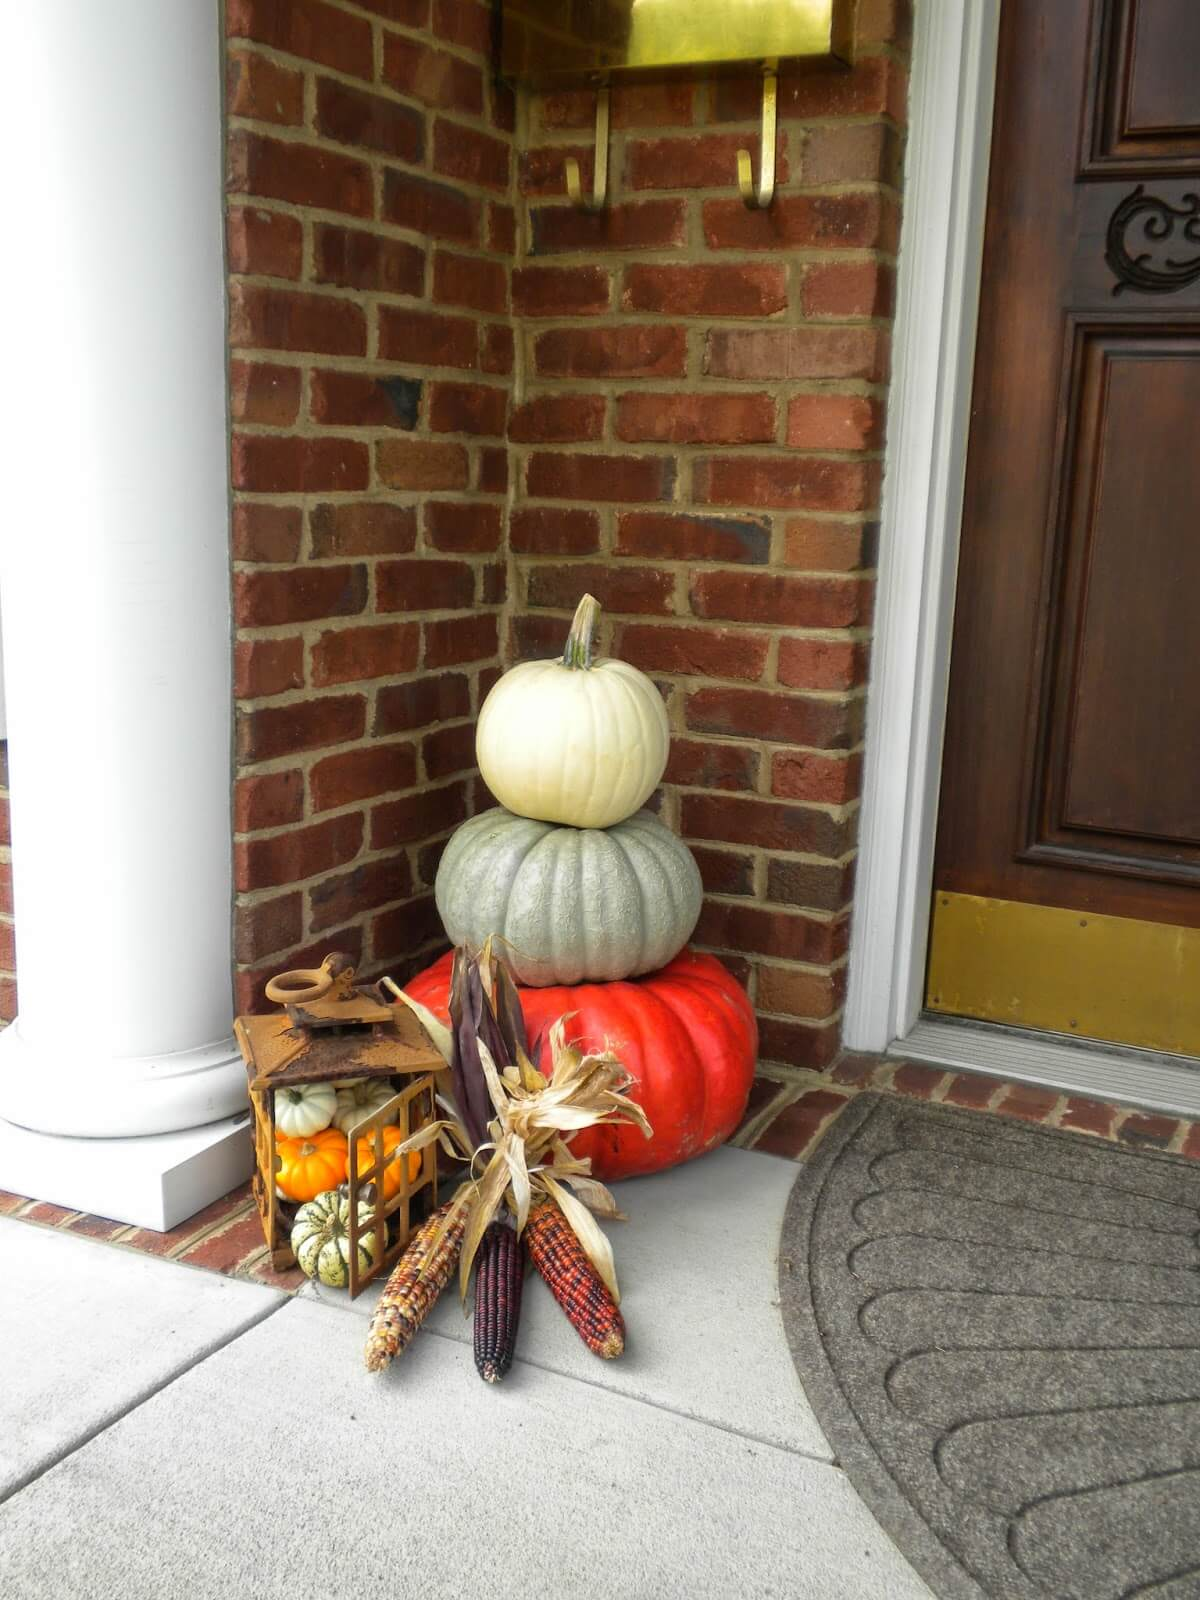 Flint Corn and Miniature Pumpkins